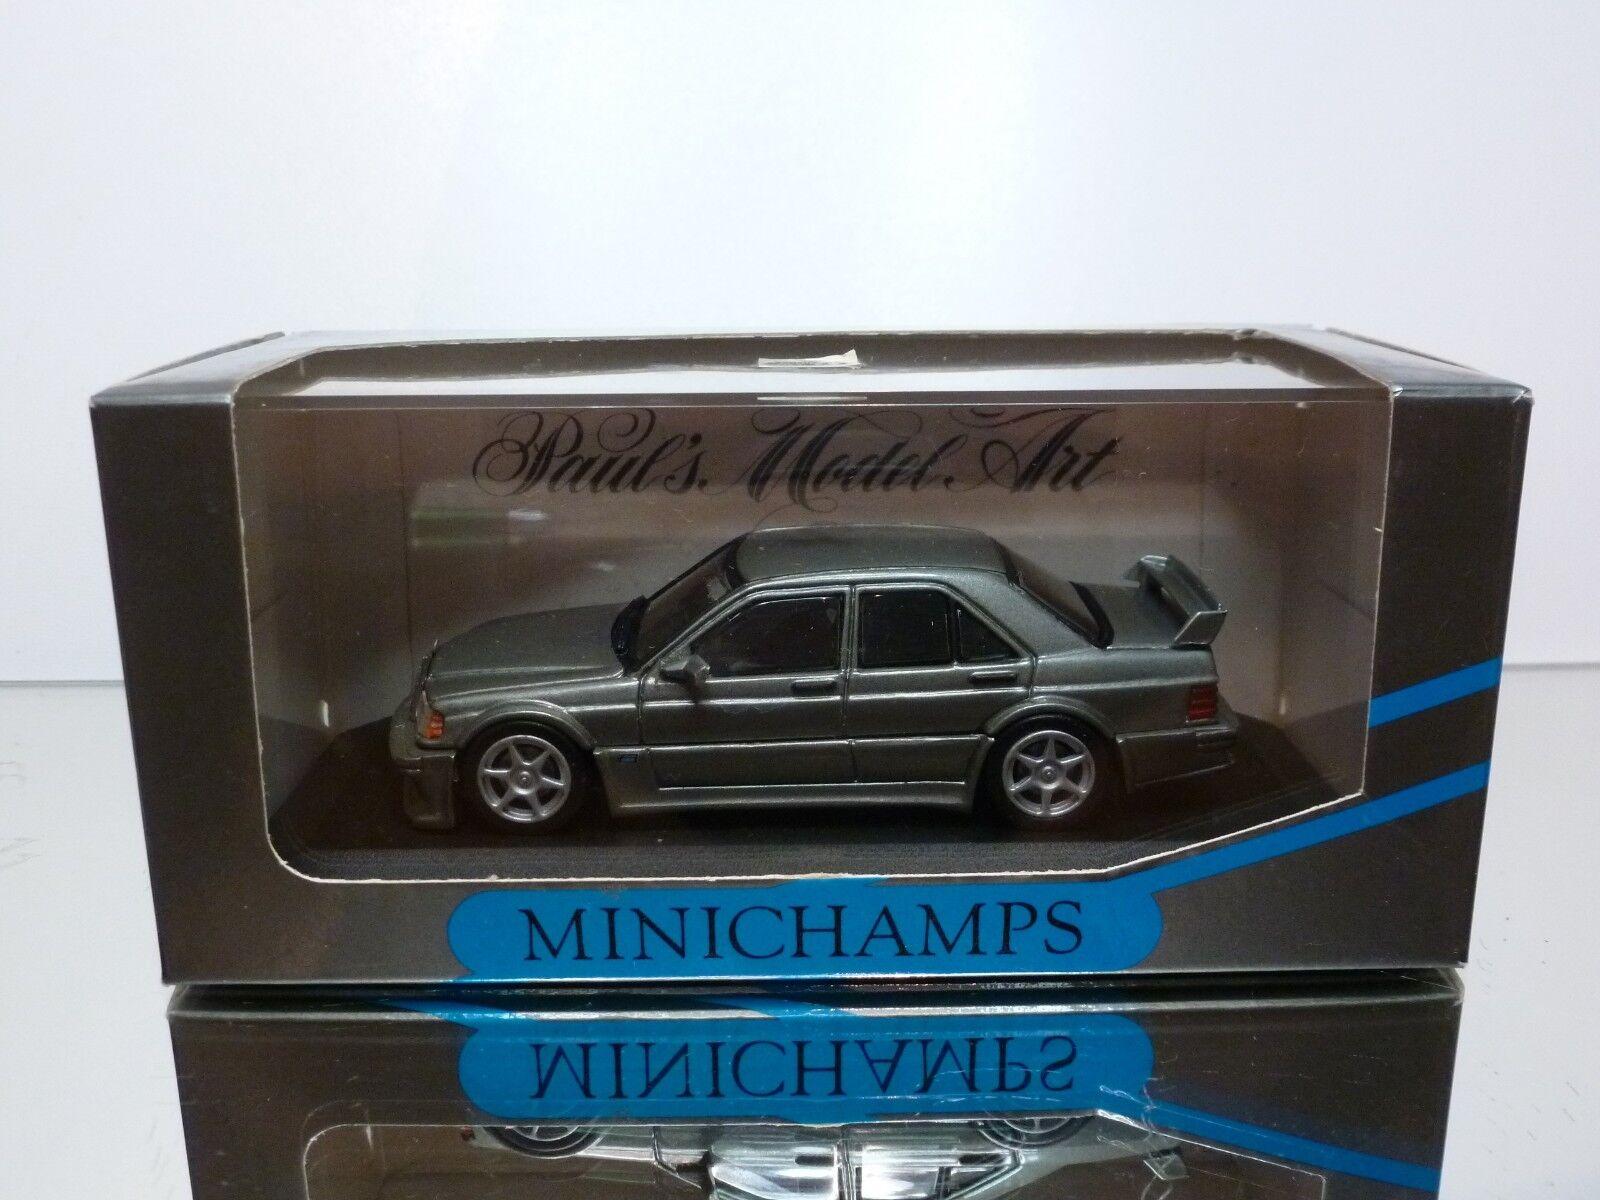 MINICHAMPS MERCEDES BENZ 190E 2.5-16 EVOLUTION - ANTHRACITE 1 43 - EXCELLENT IB